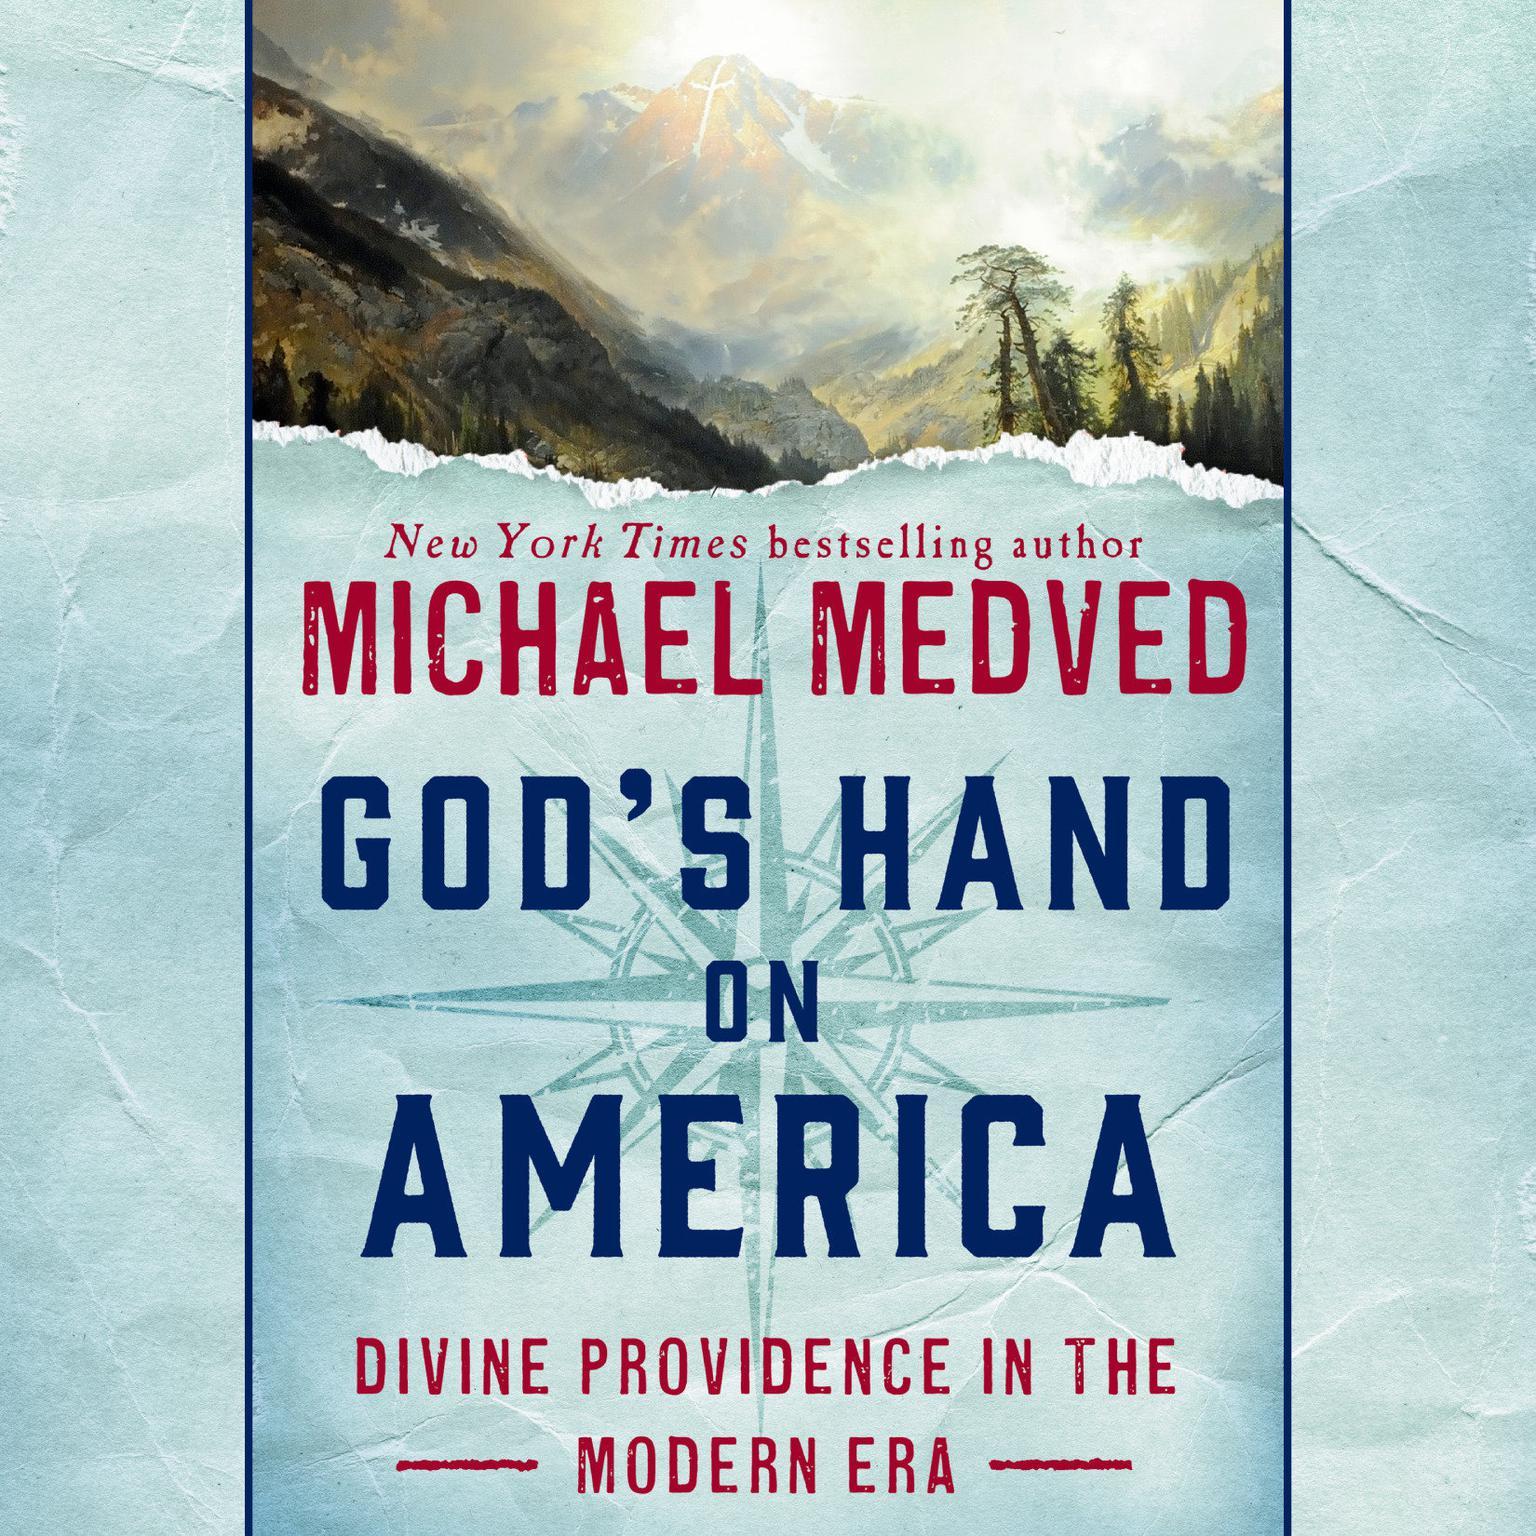 Gods Hand on America: Divine Providence in the Modern Era Audiobook, by Michael Medved